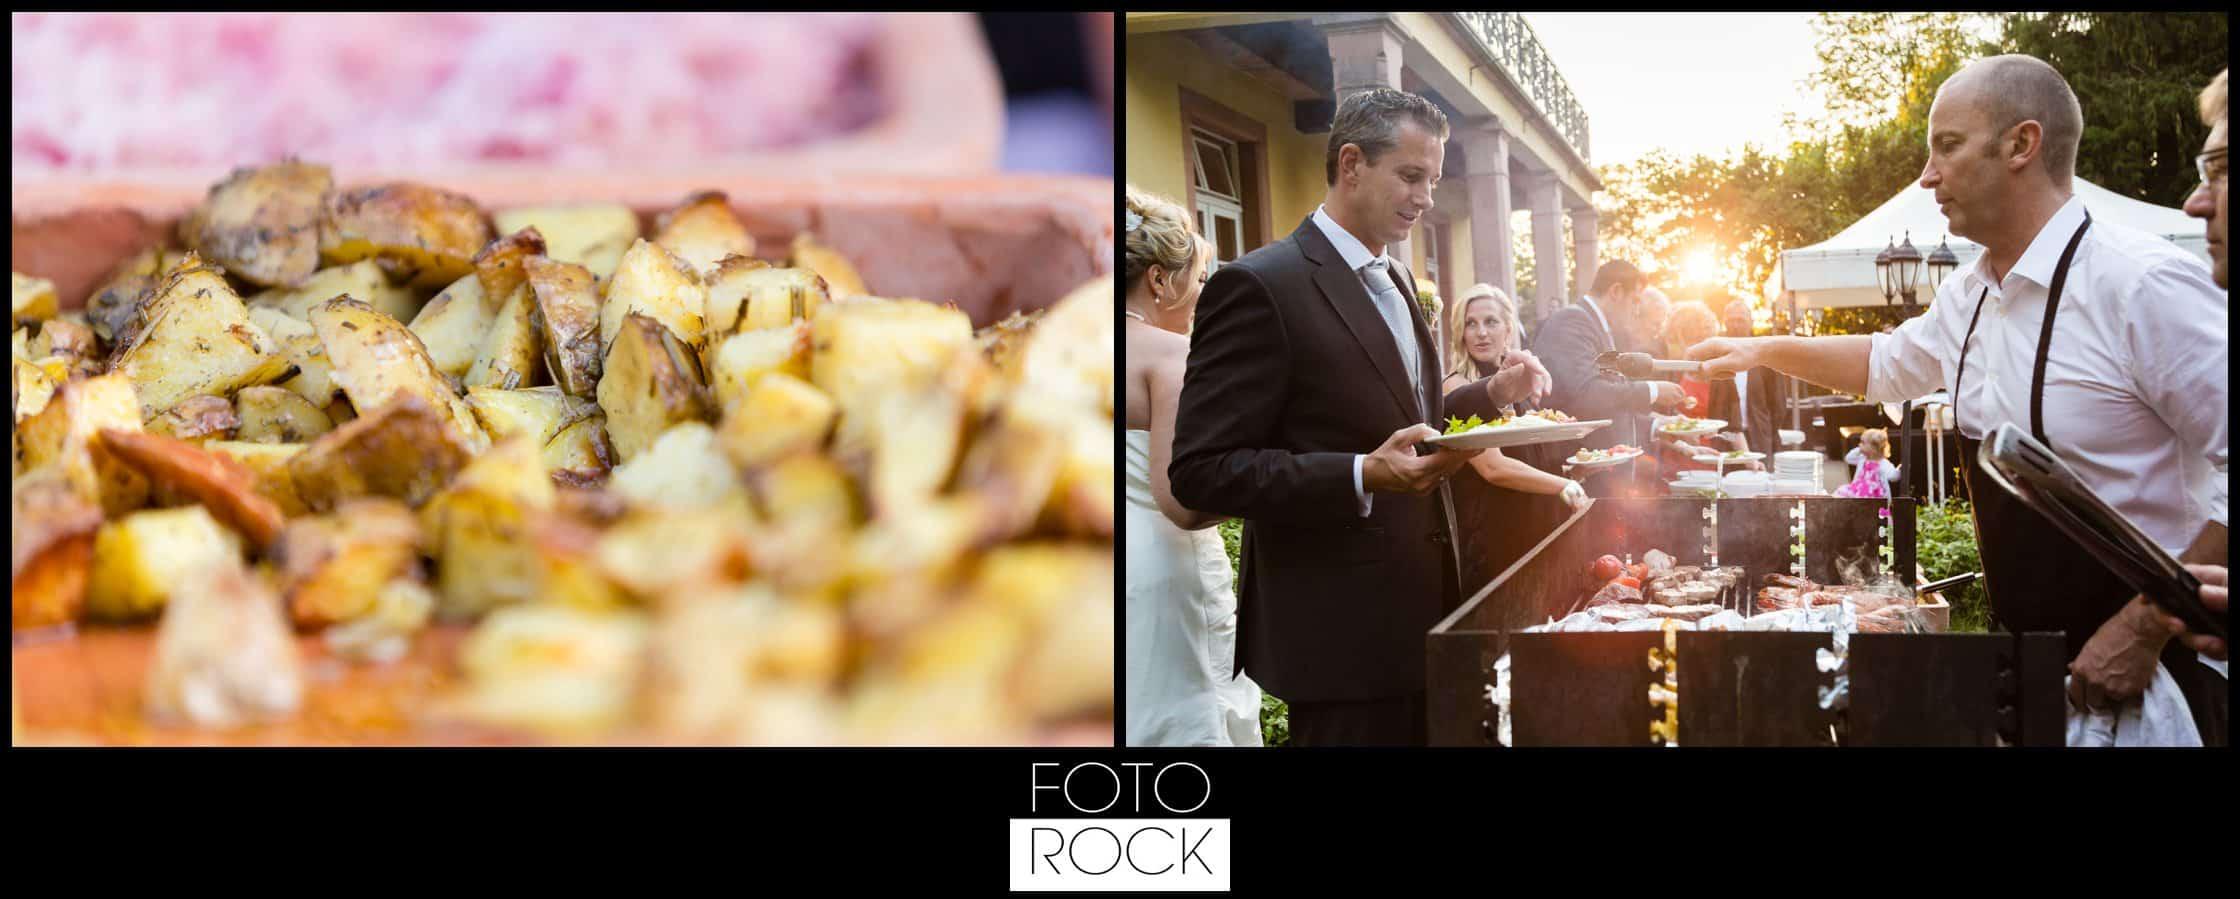 Hochzeit Jesuitenschloss Freiburg catering buffet essen